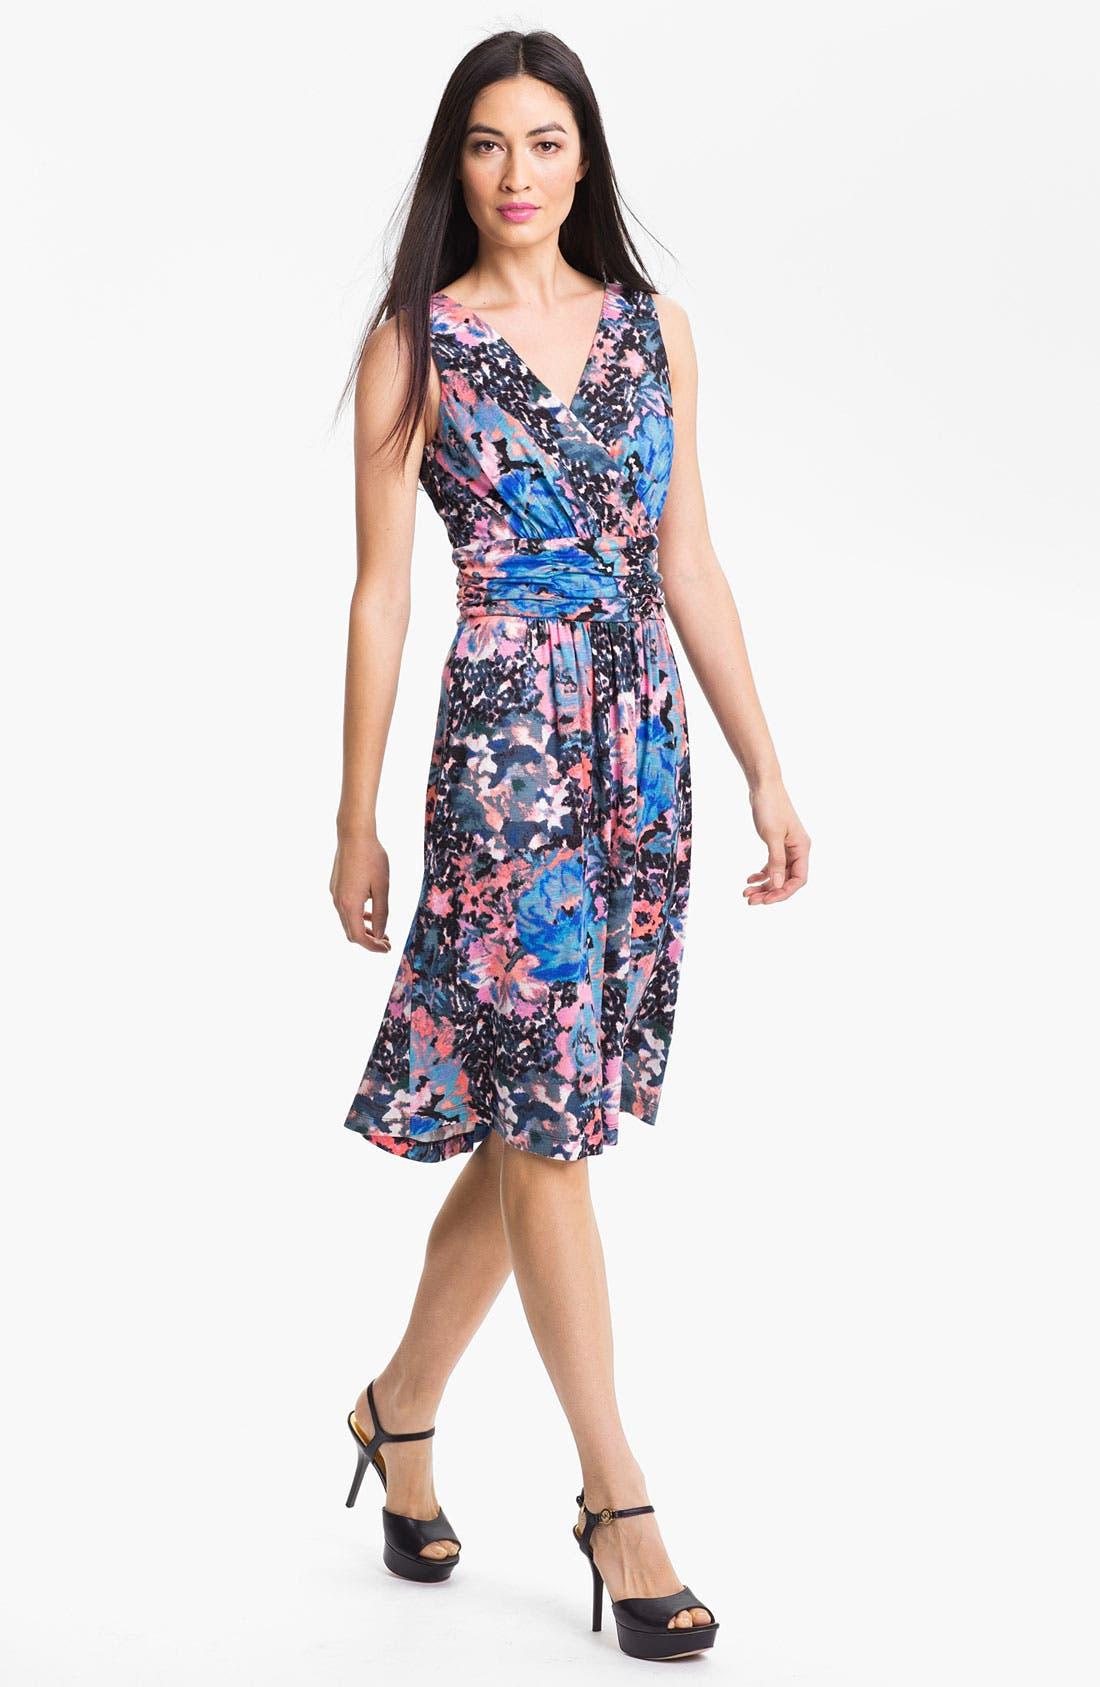 Alternate Image 1 Selected - Nic + Zoe 'Nocturnal Garden' Dress